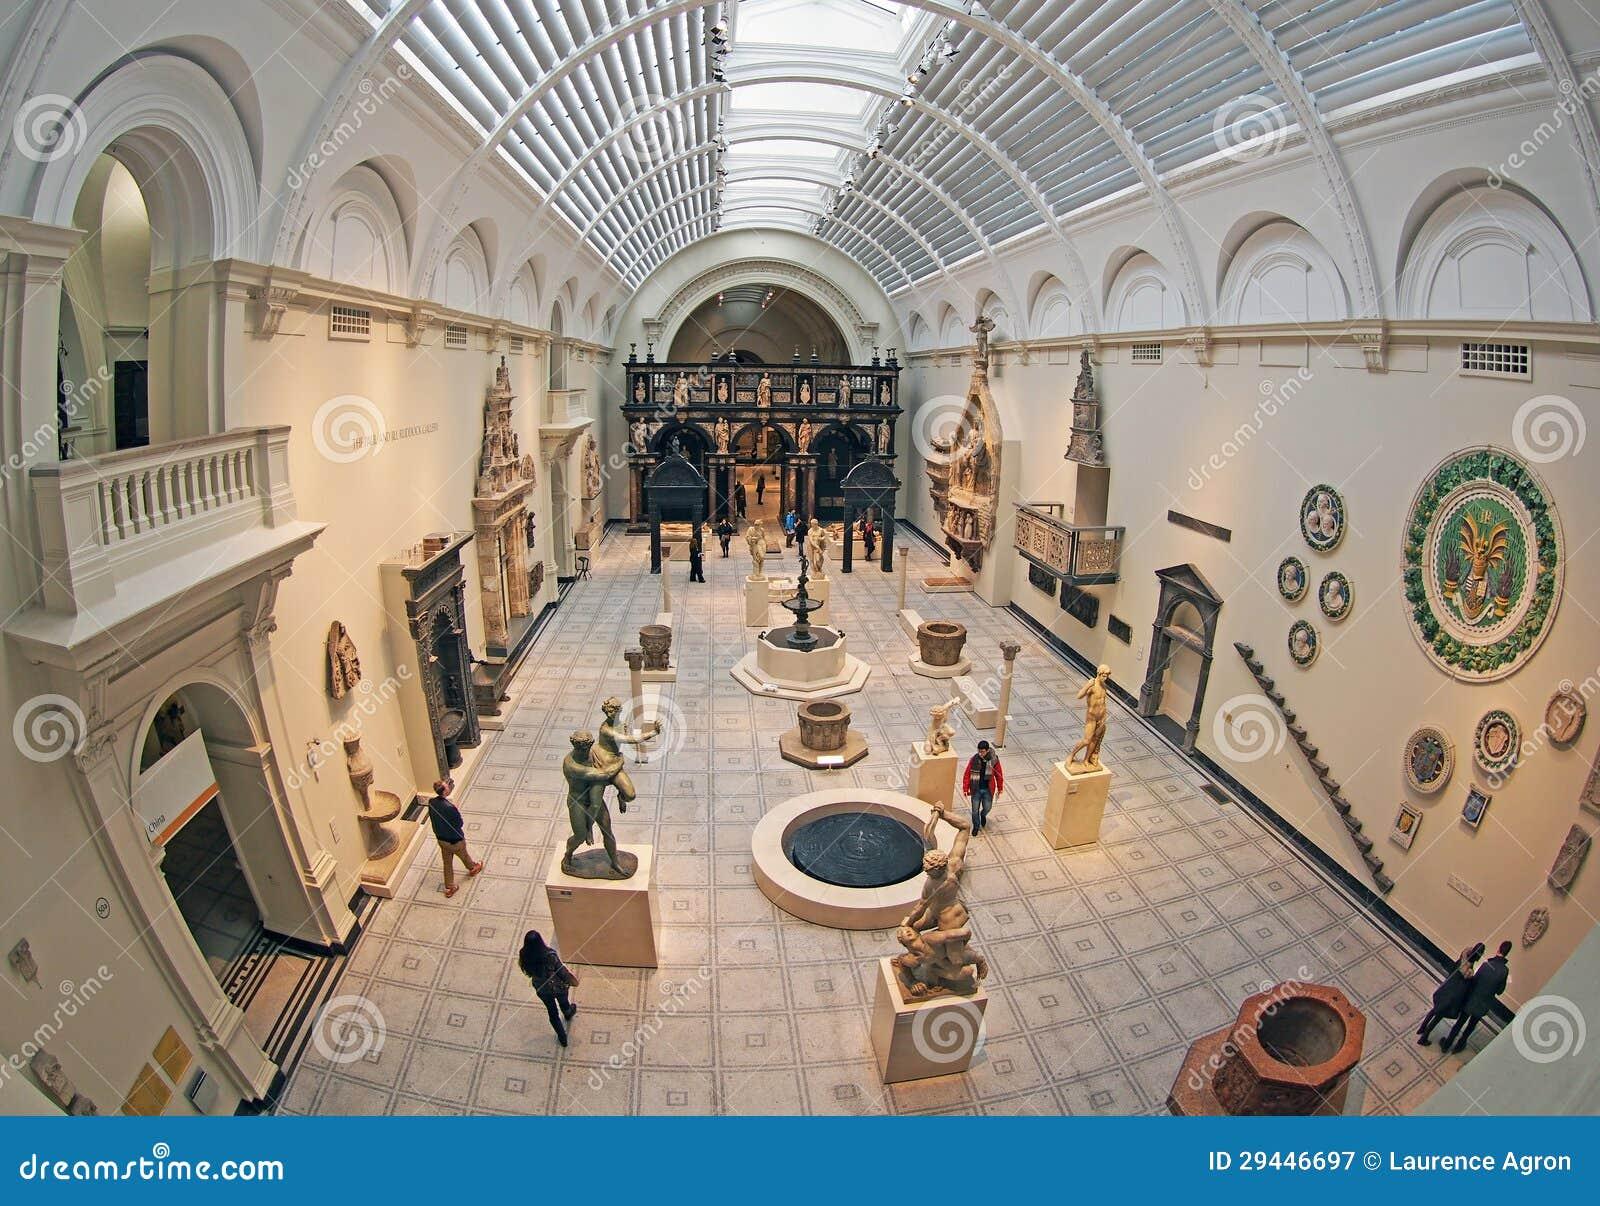 Victoria And Albert Museum Interior Editorial Photography